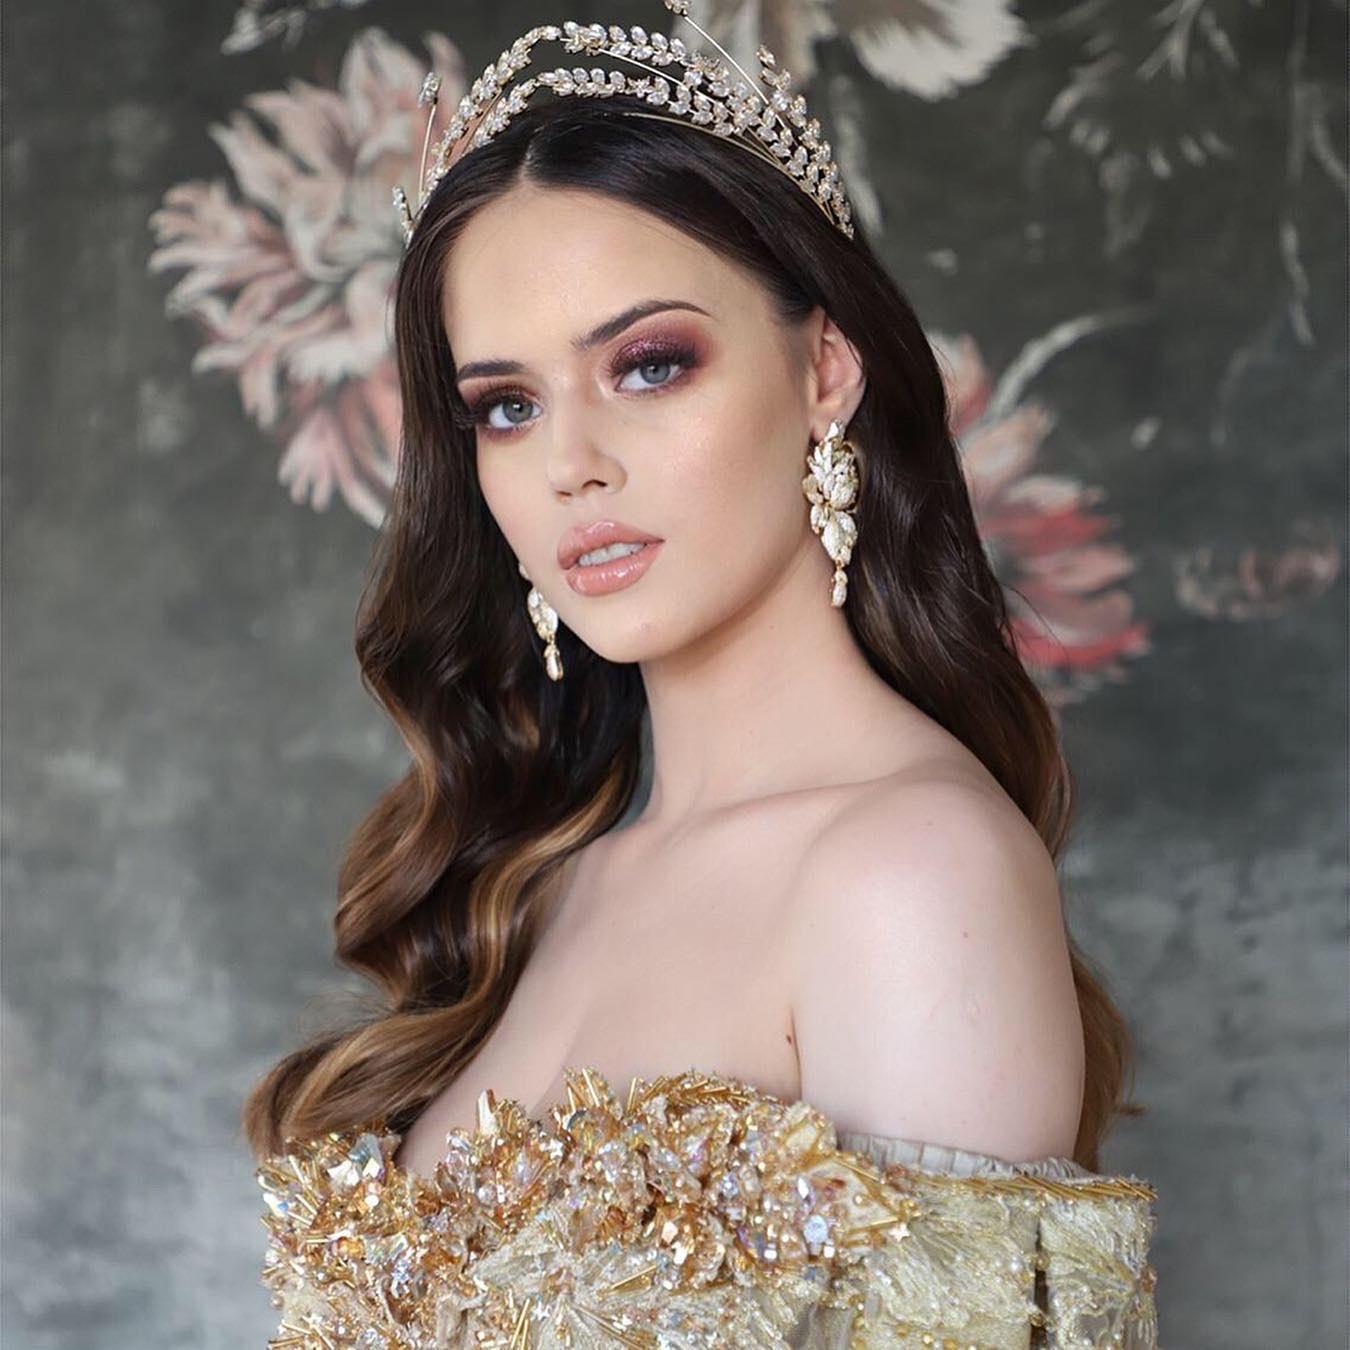 rayhane_plus_belles_mariées_tunisiennes_189_2019